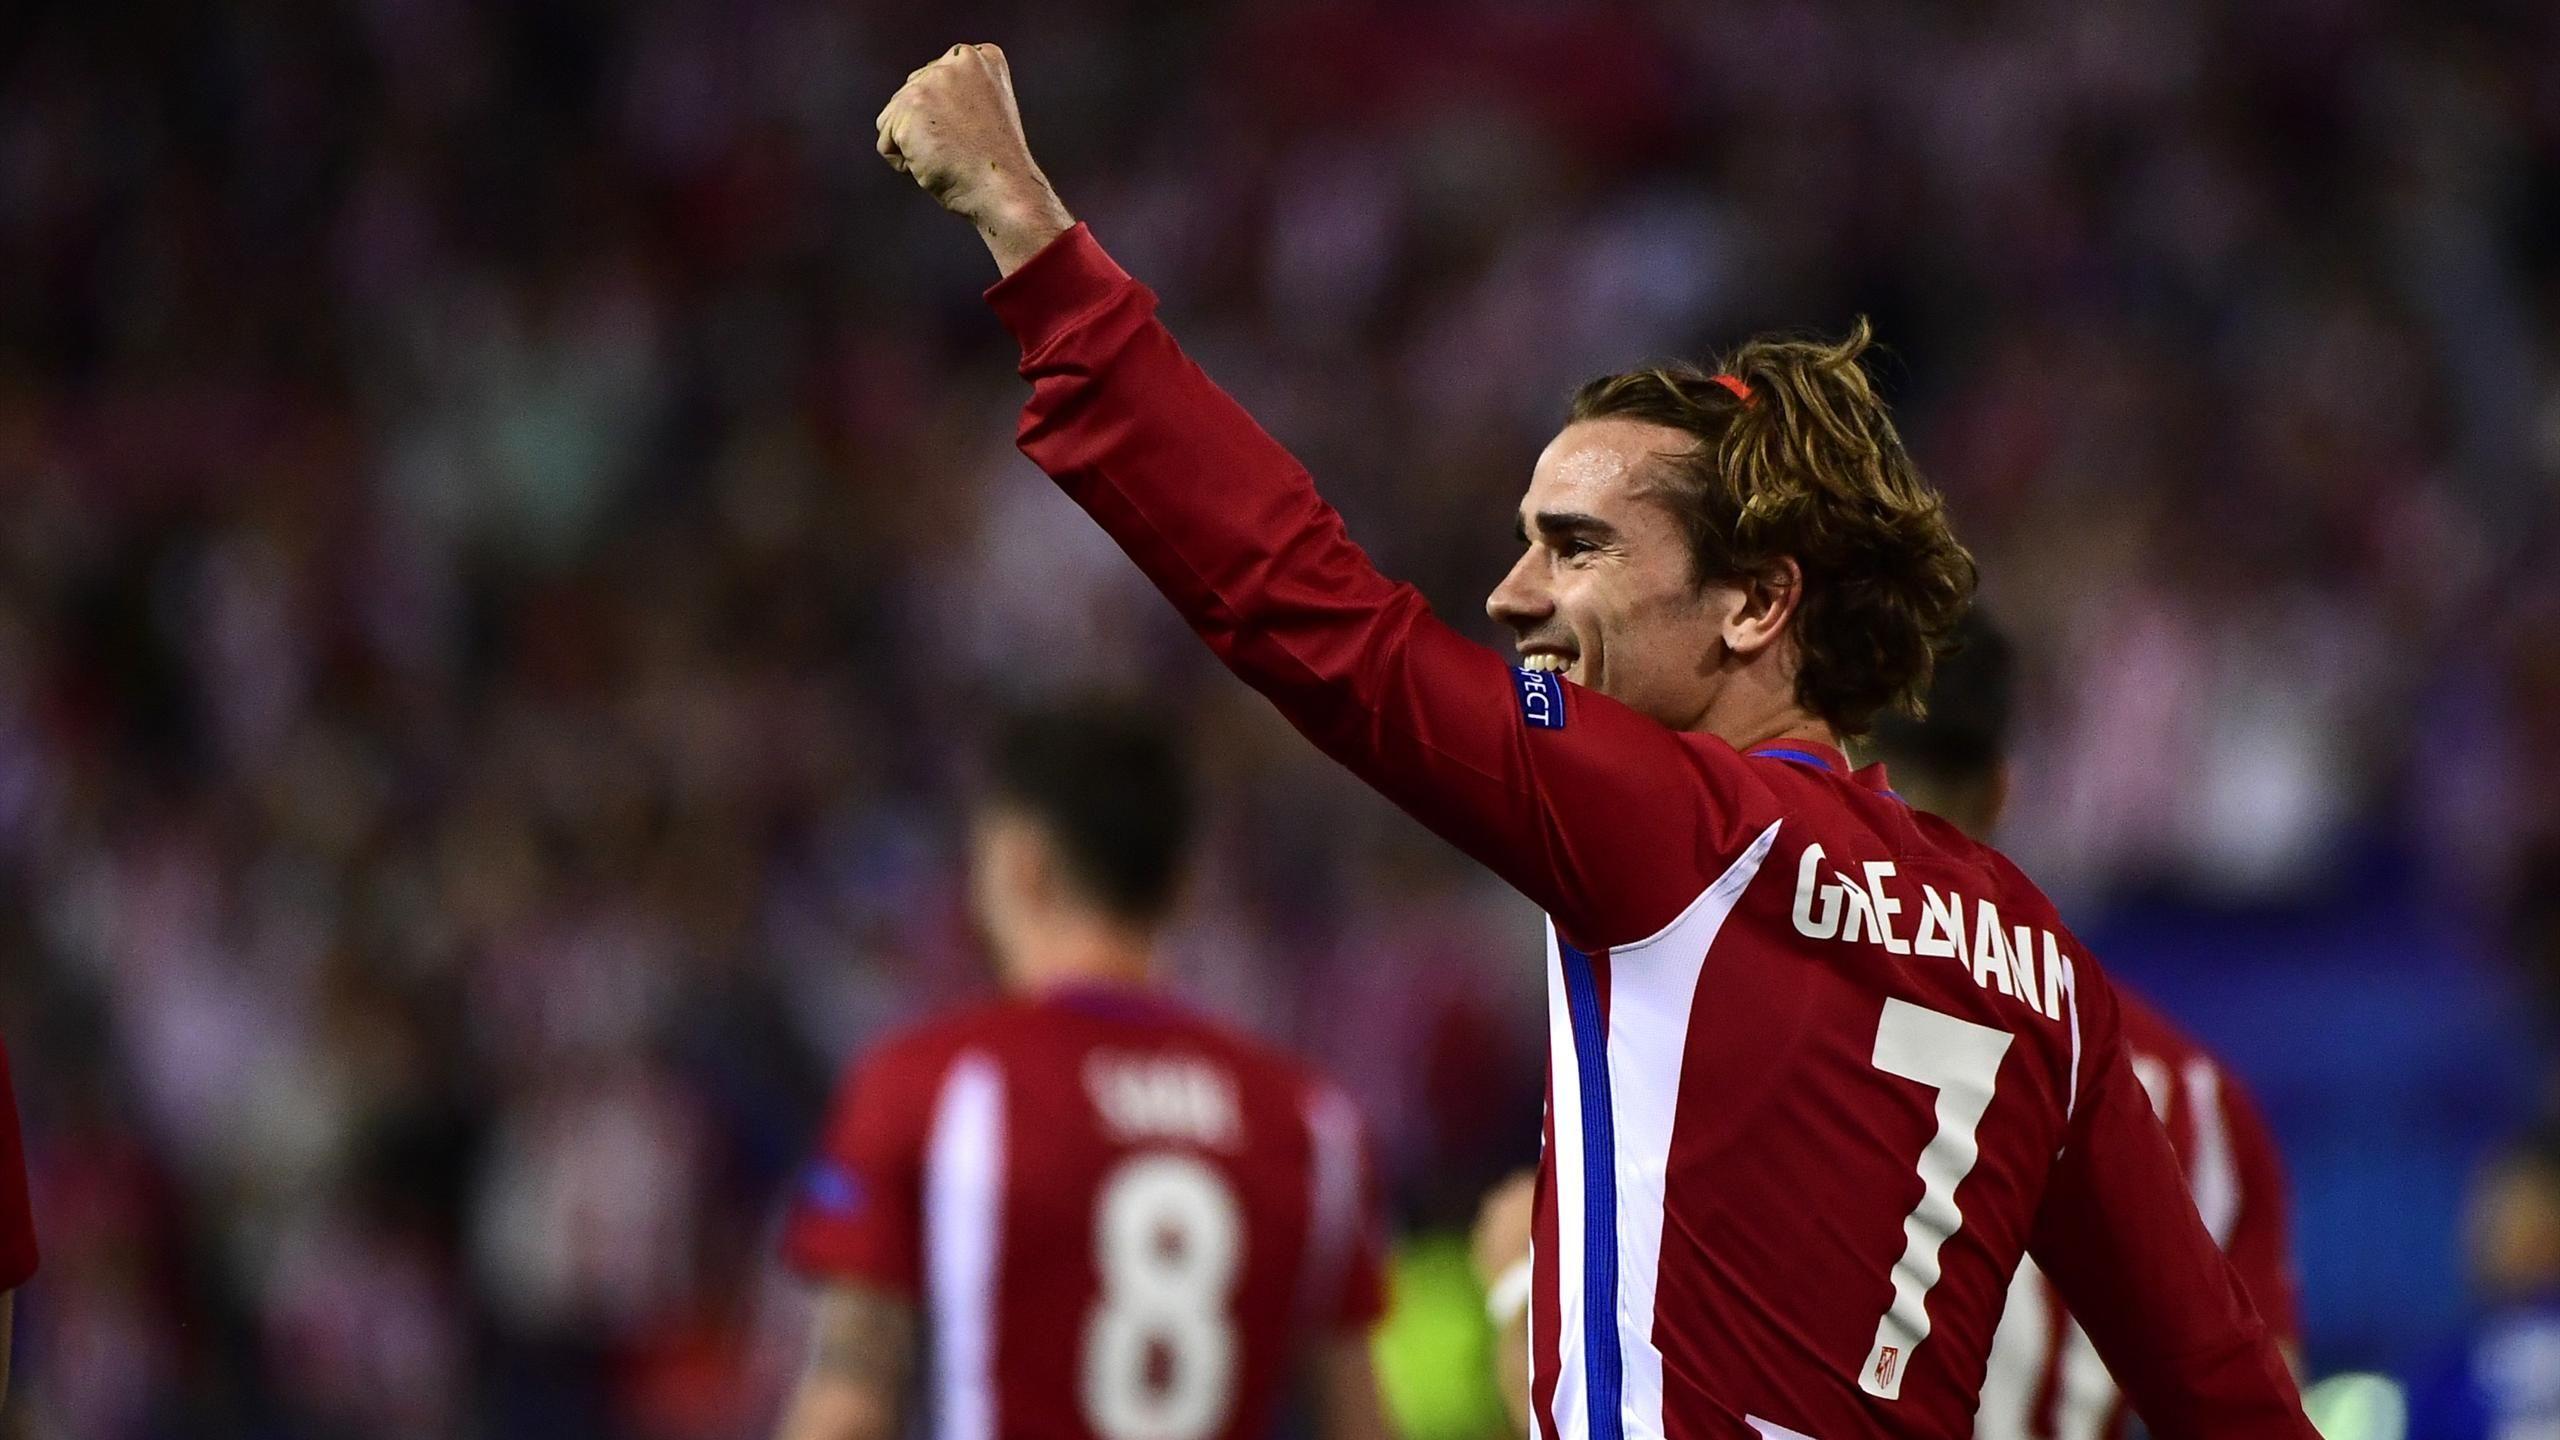 Прогноз на матч Атлетико Мадрид - Спортинг Лиссабон 05 апреля 2018